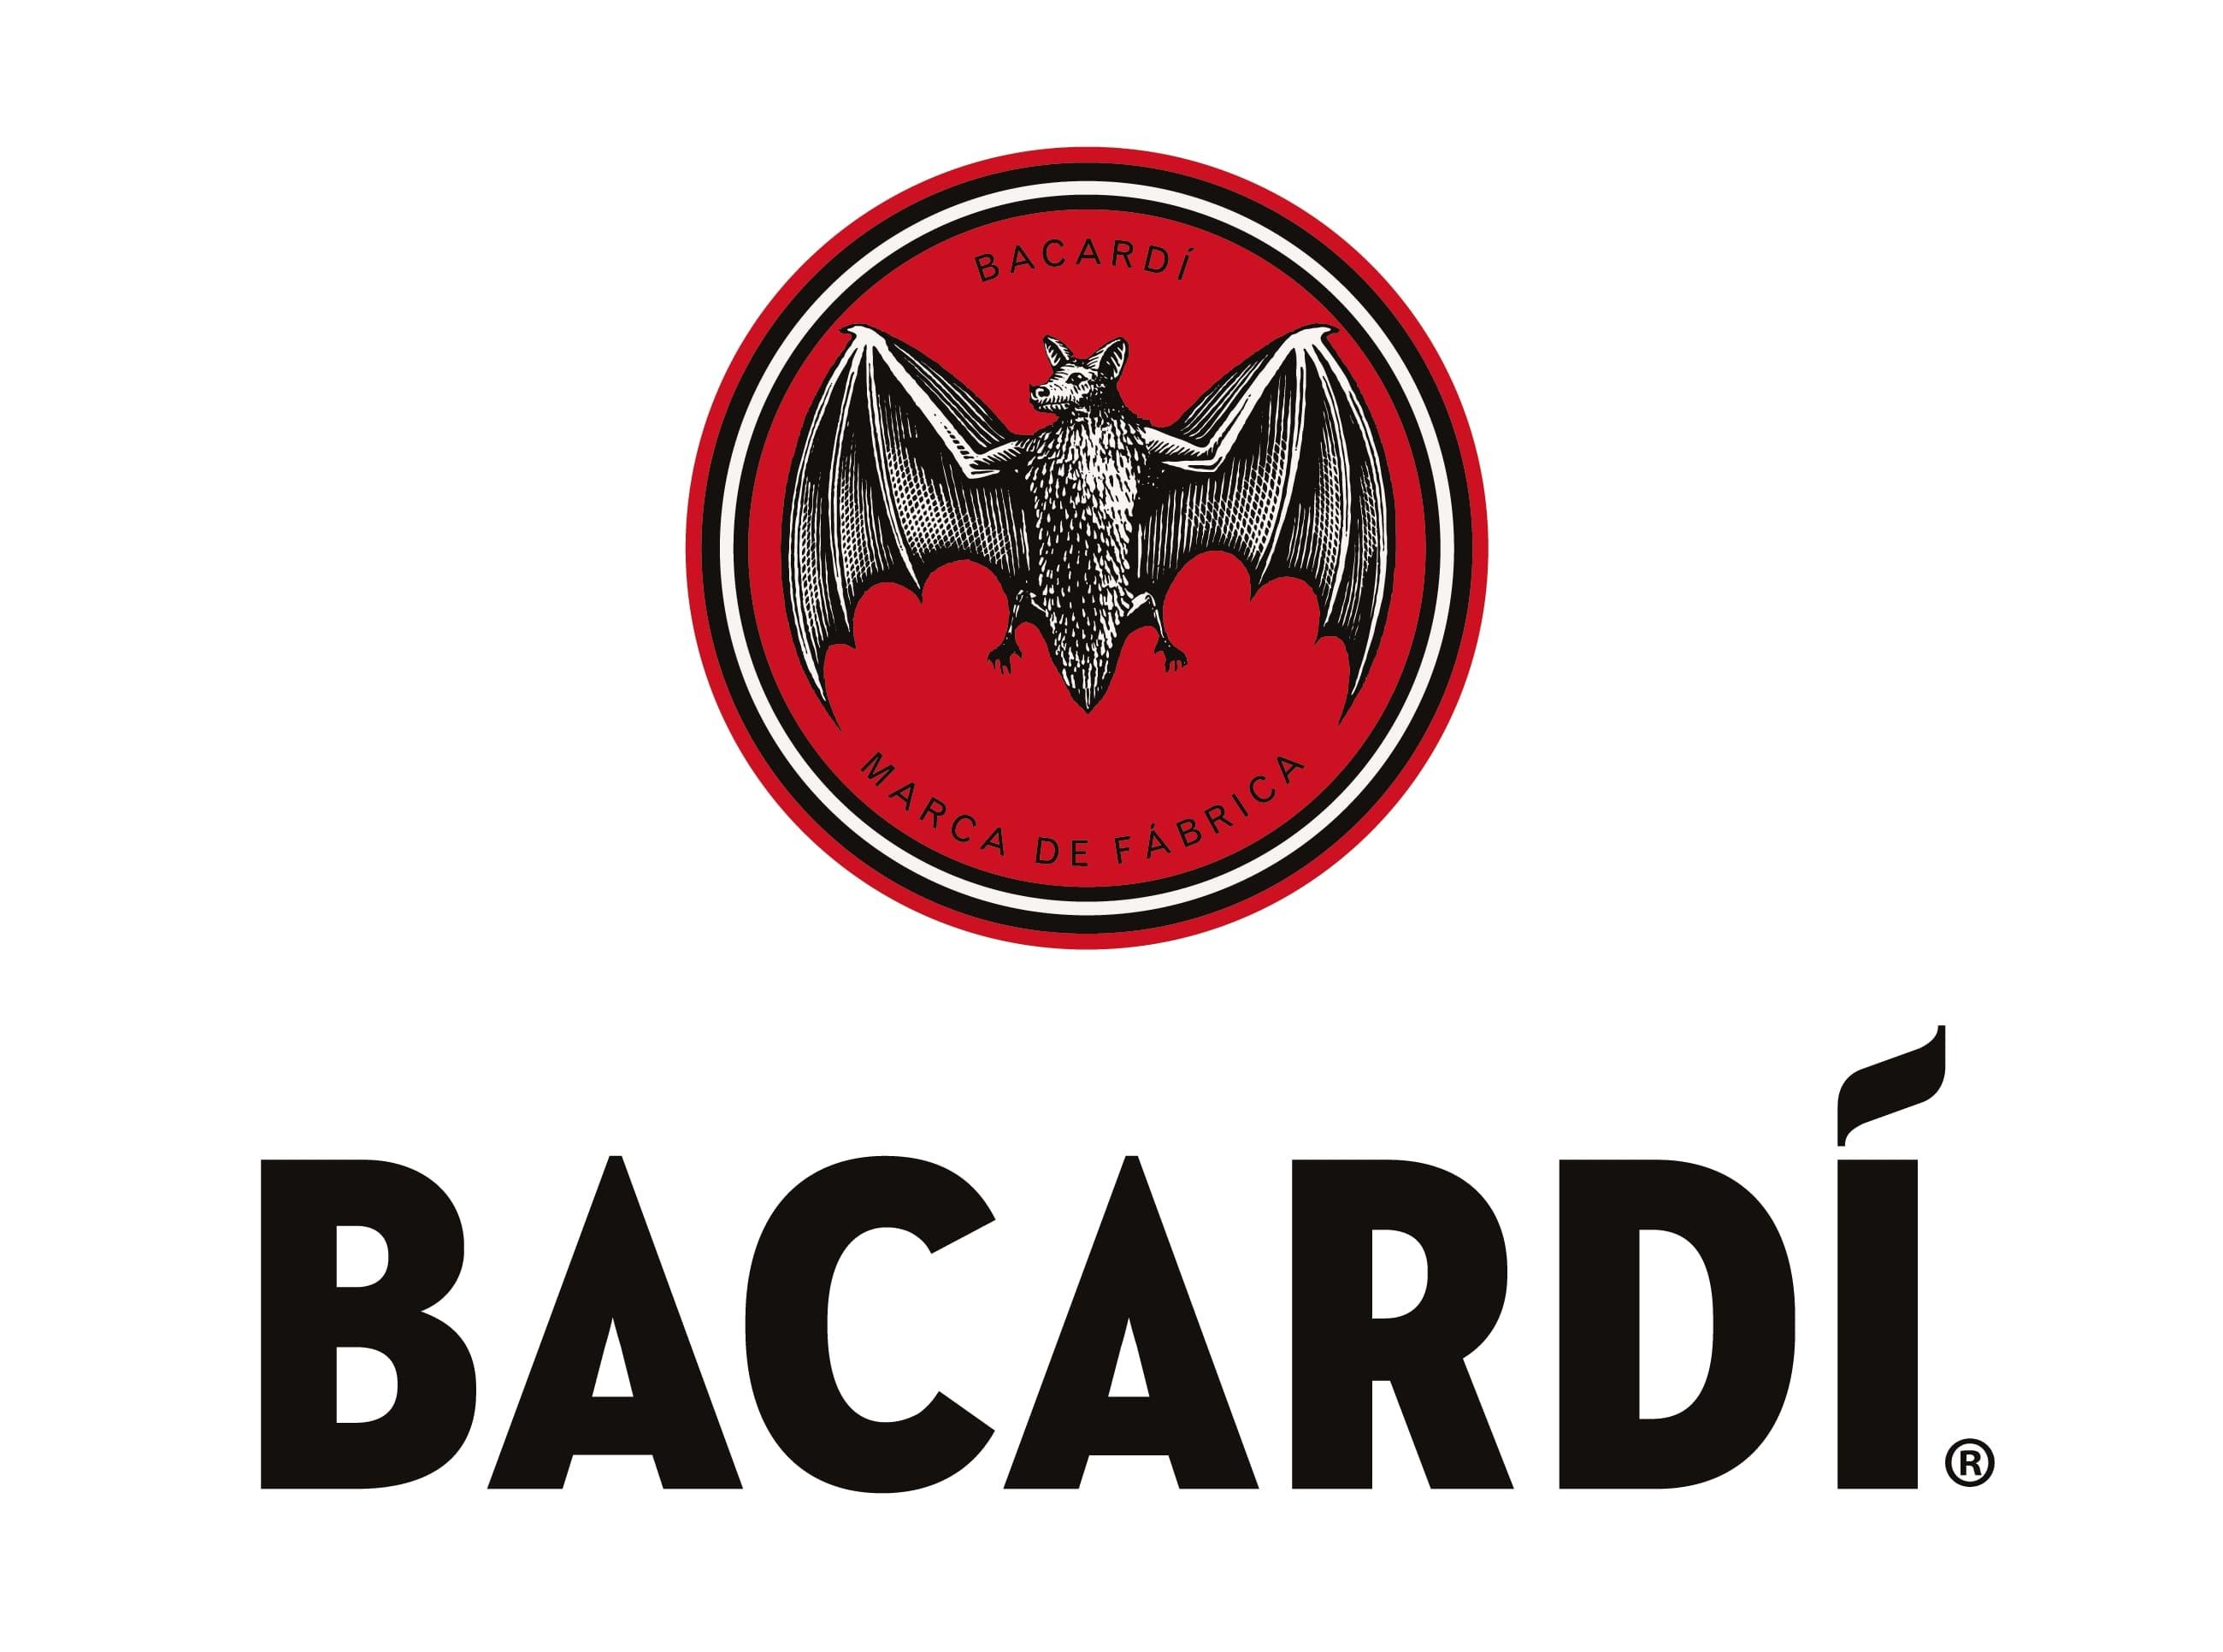 8_Bacardi-logo